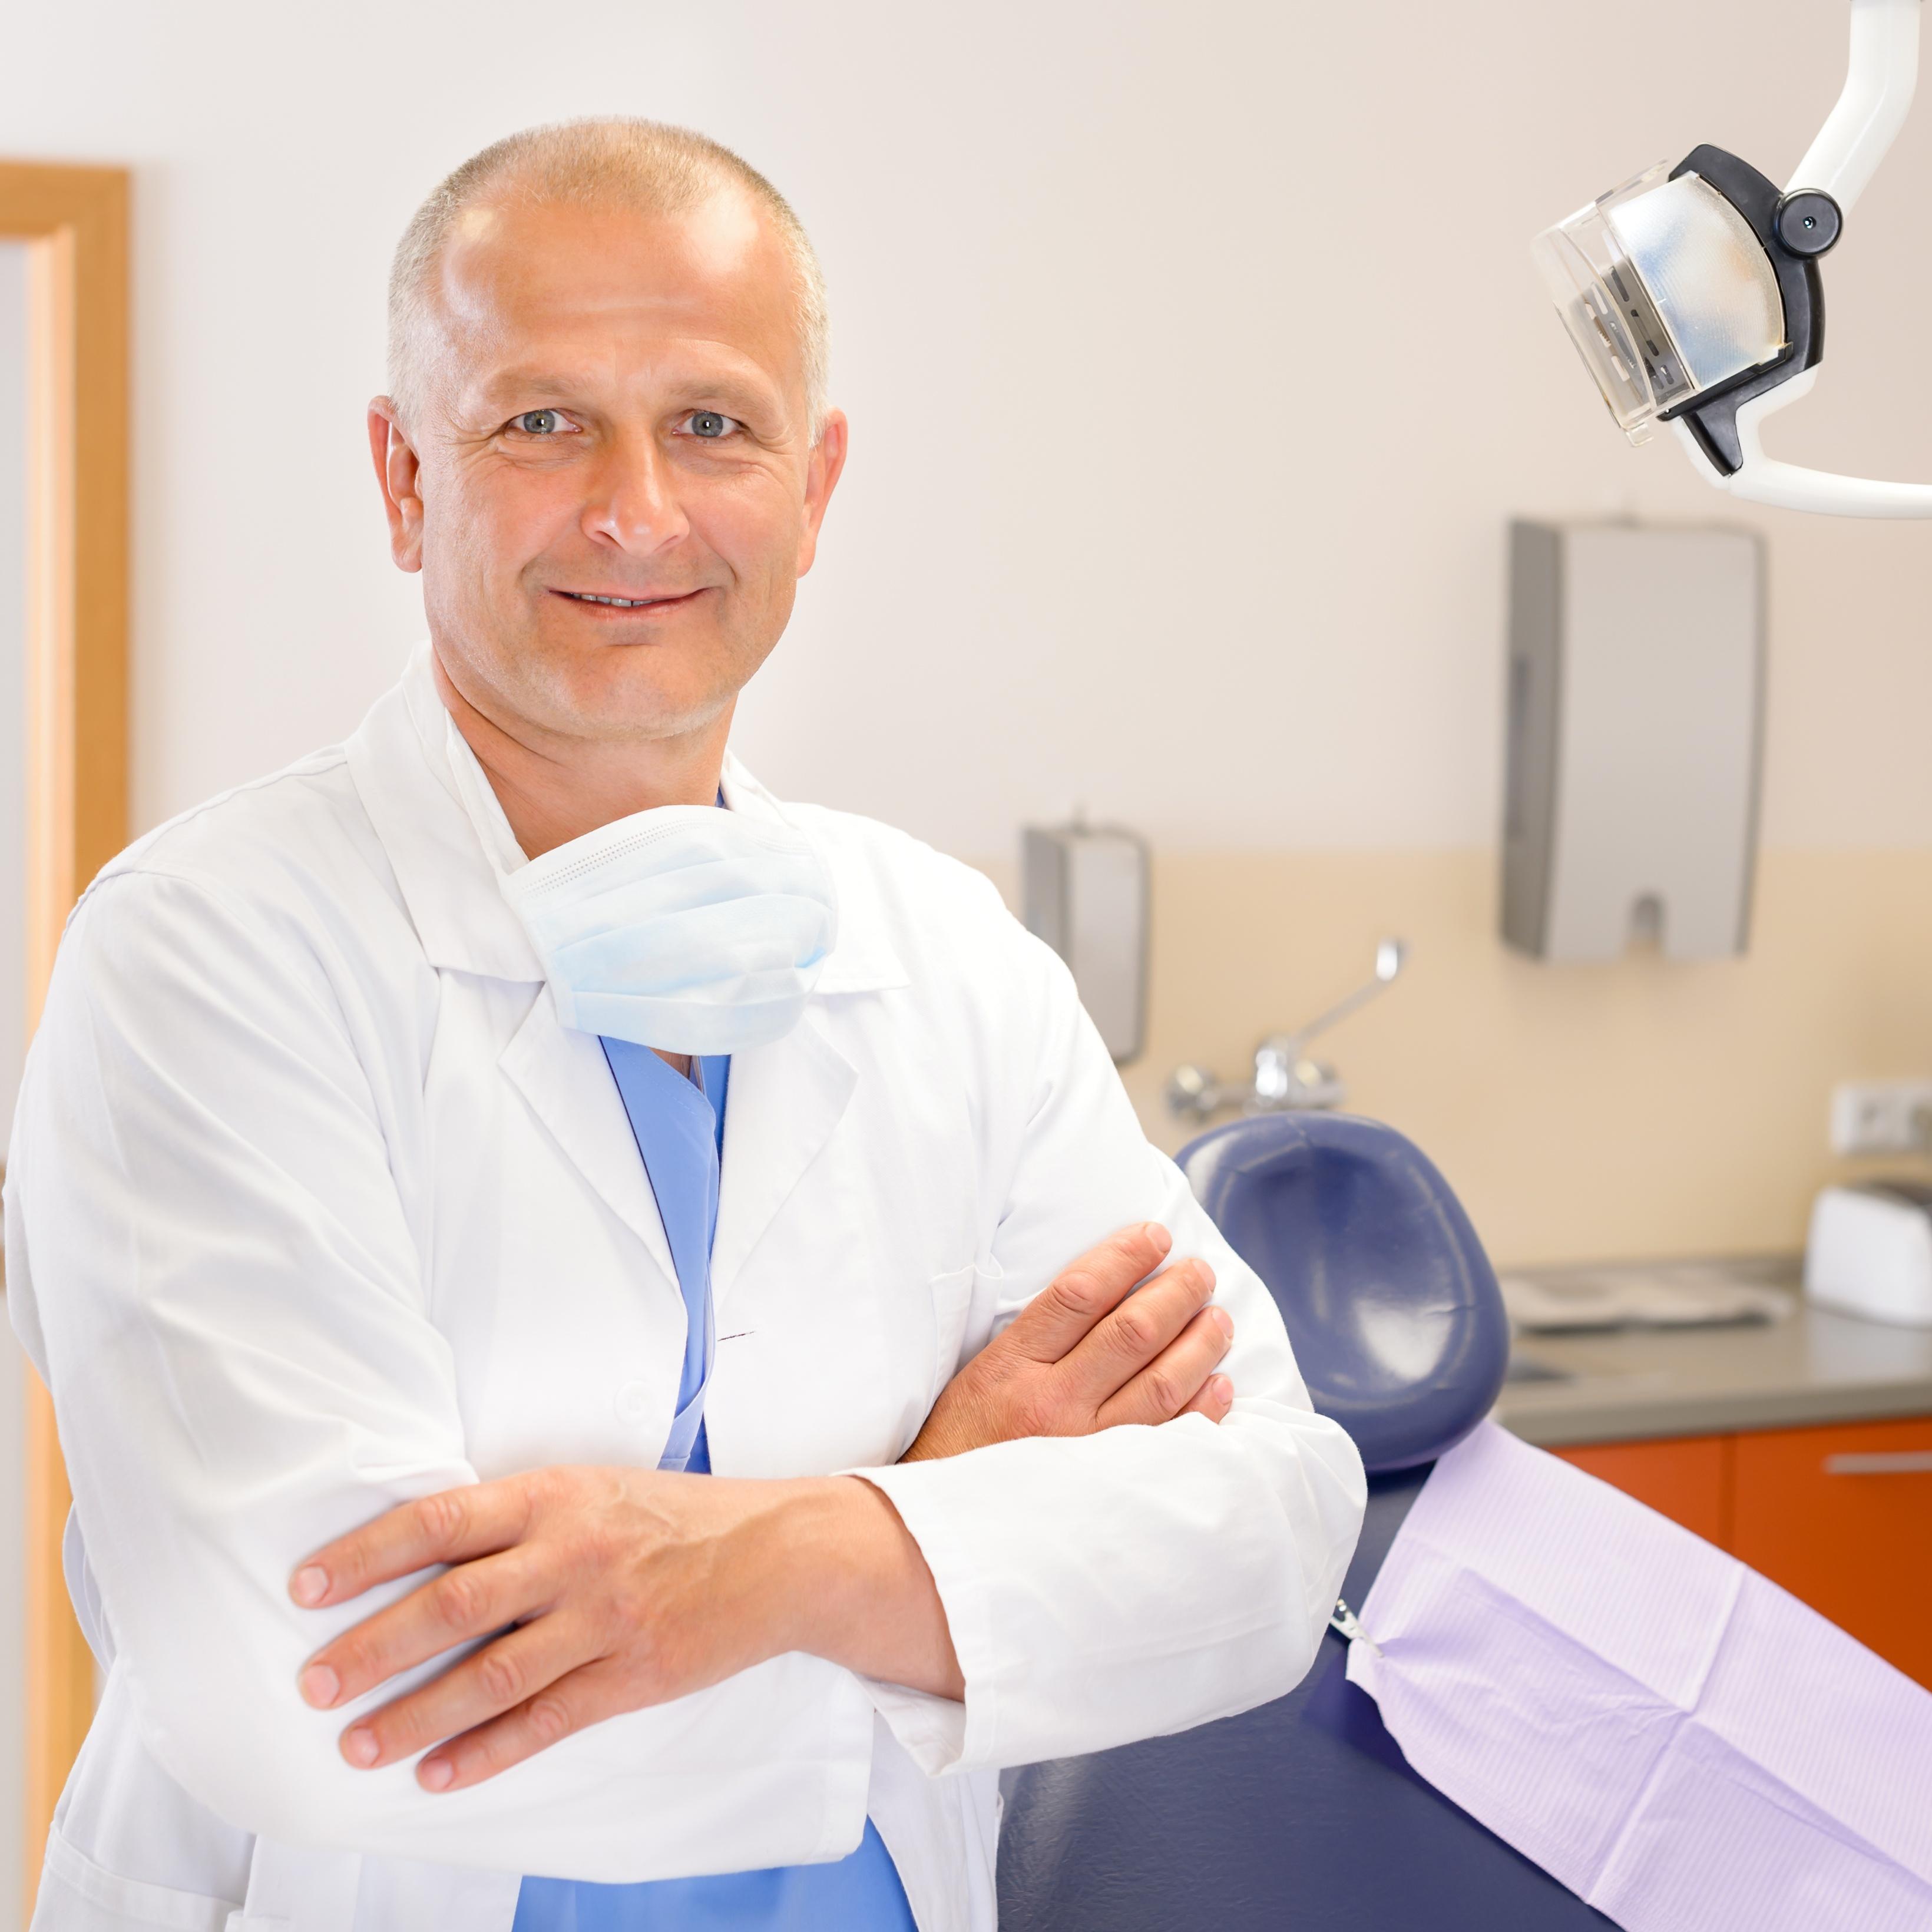 Experienced Dentist in Leonia